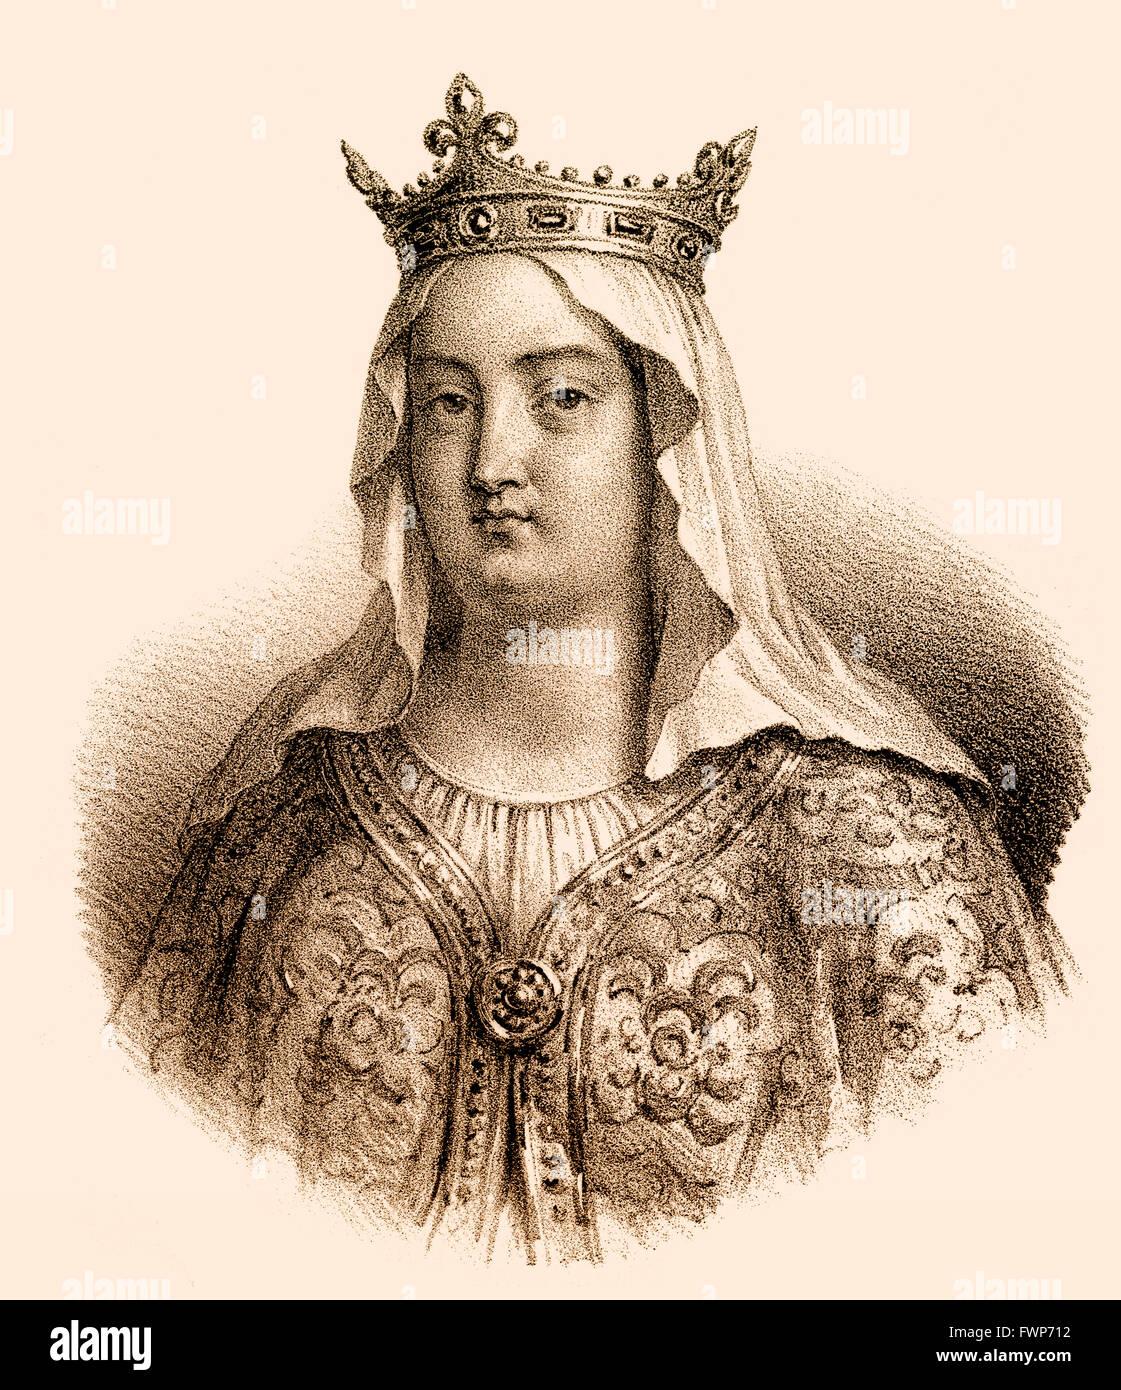 Fredegund, Fredegunda, Fredegunde, Fredegundis, Frédégonde, c. 545-597, la regina consorte di Chilperic i Merovingi Frankie Foto Stock